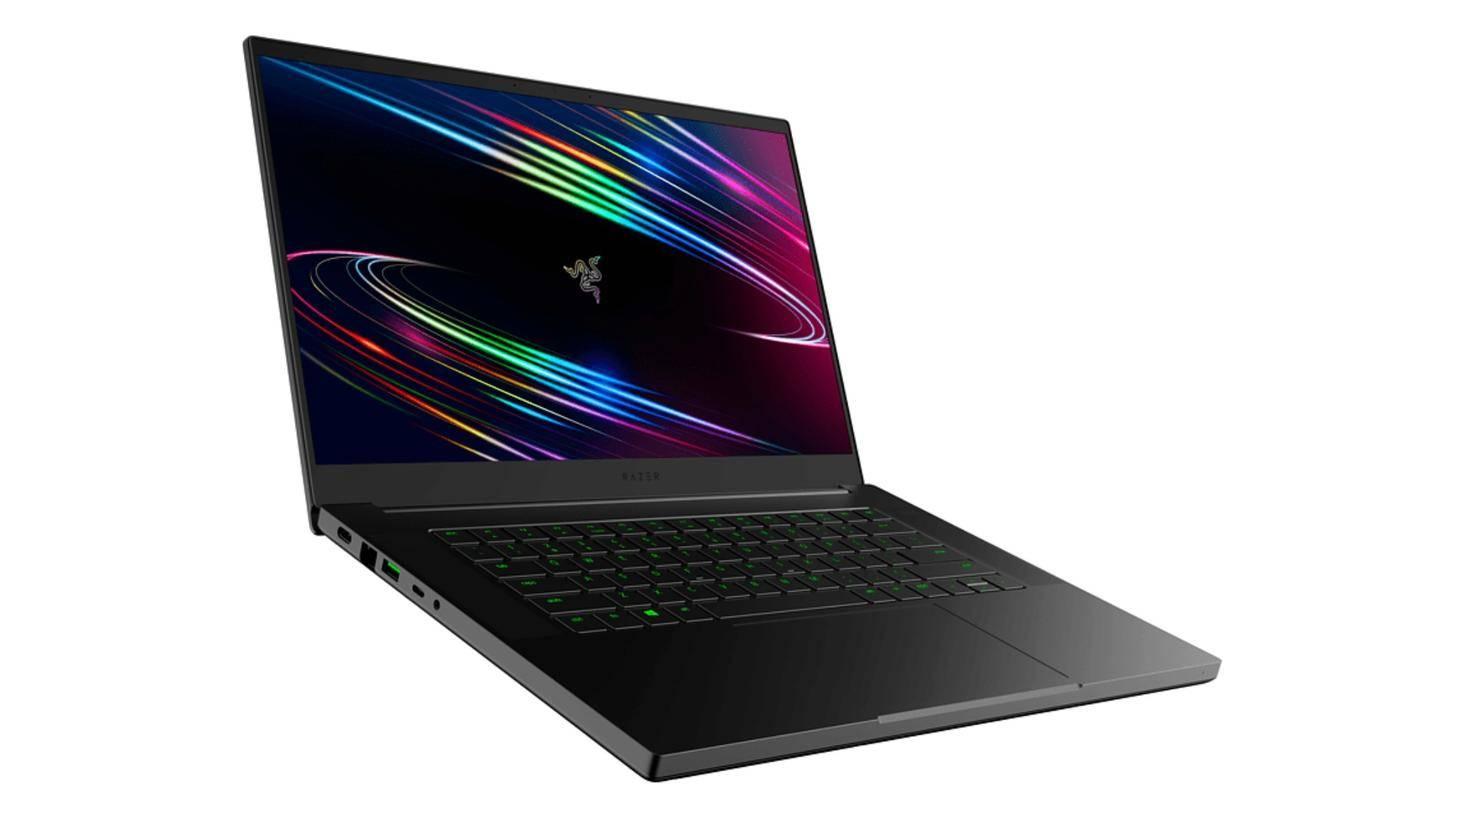 Razer-Blade-15-Gaming-Notebook